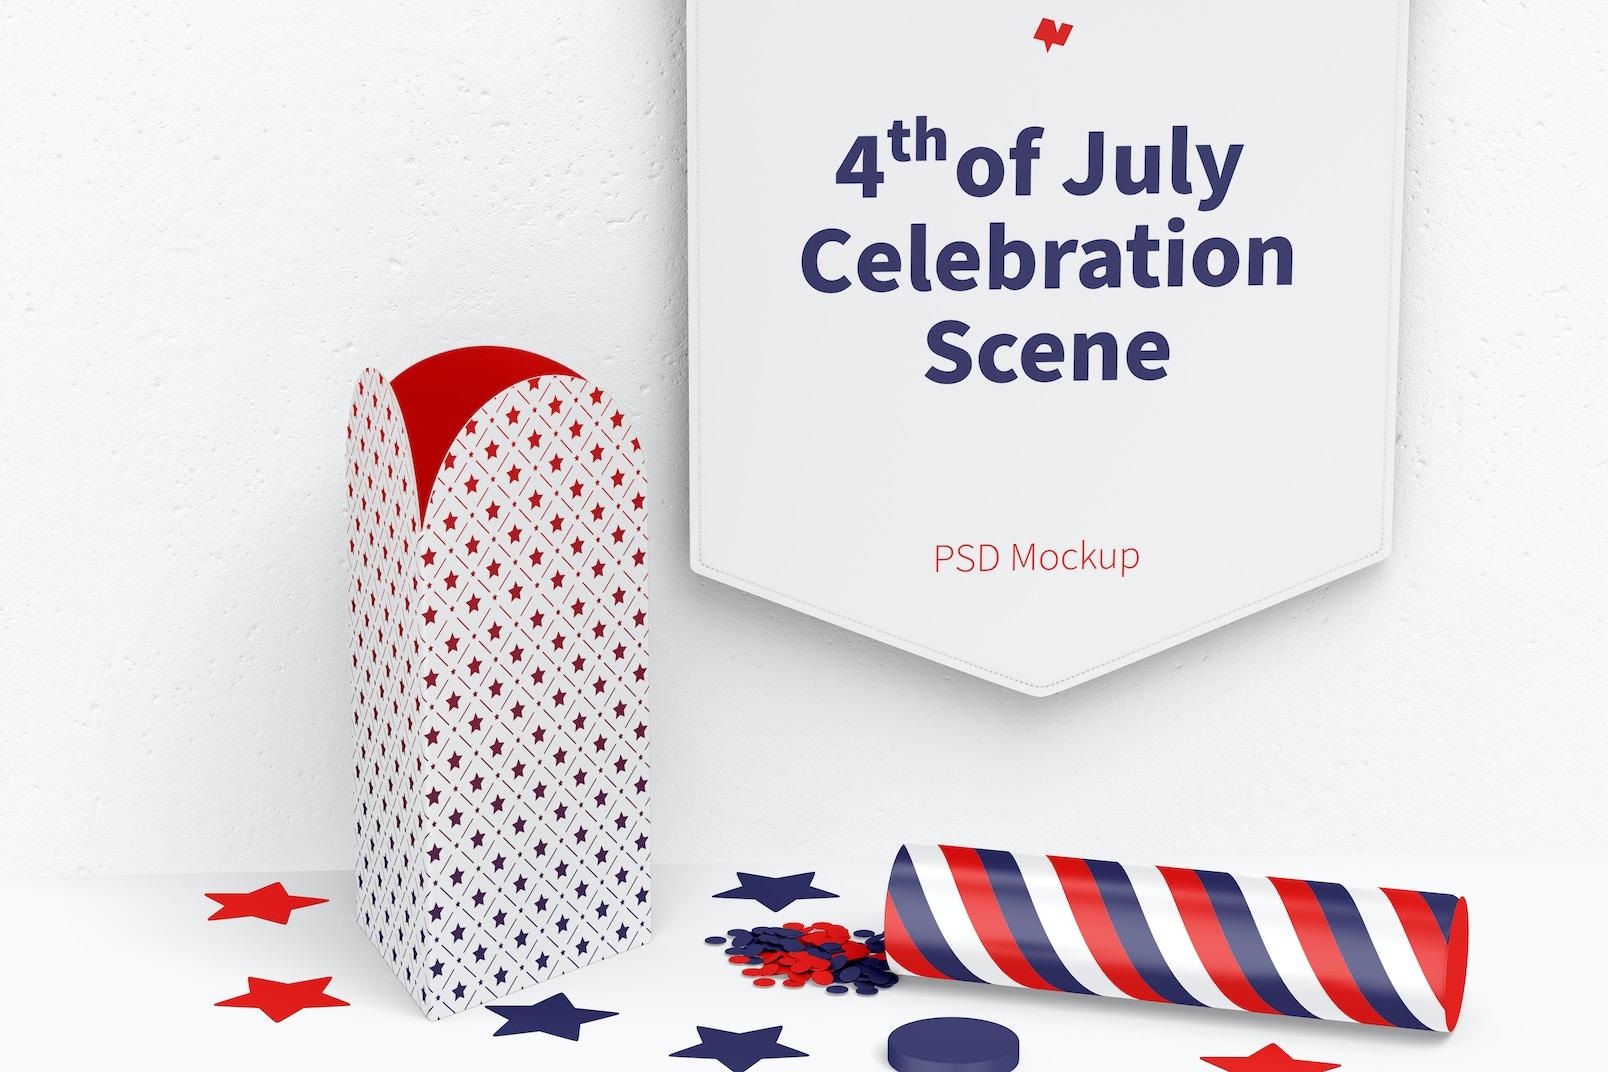 4th of July Celebration Scene Mockup